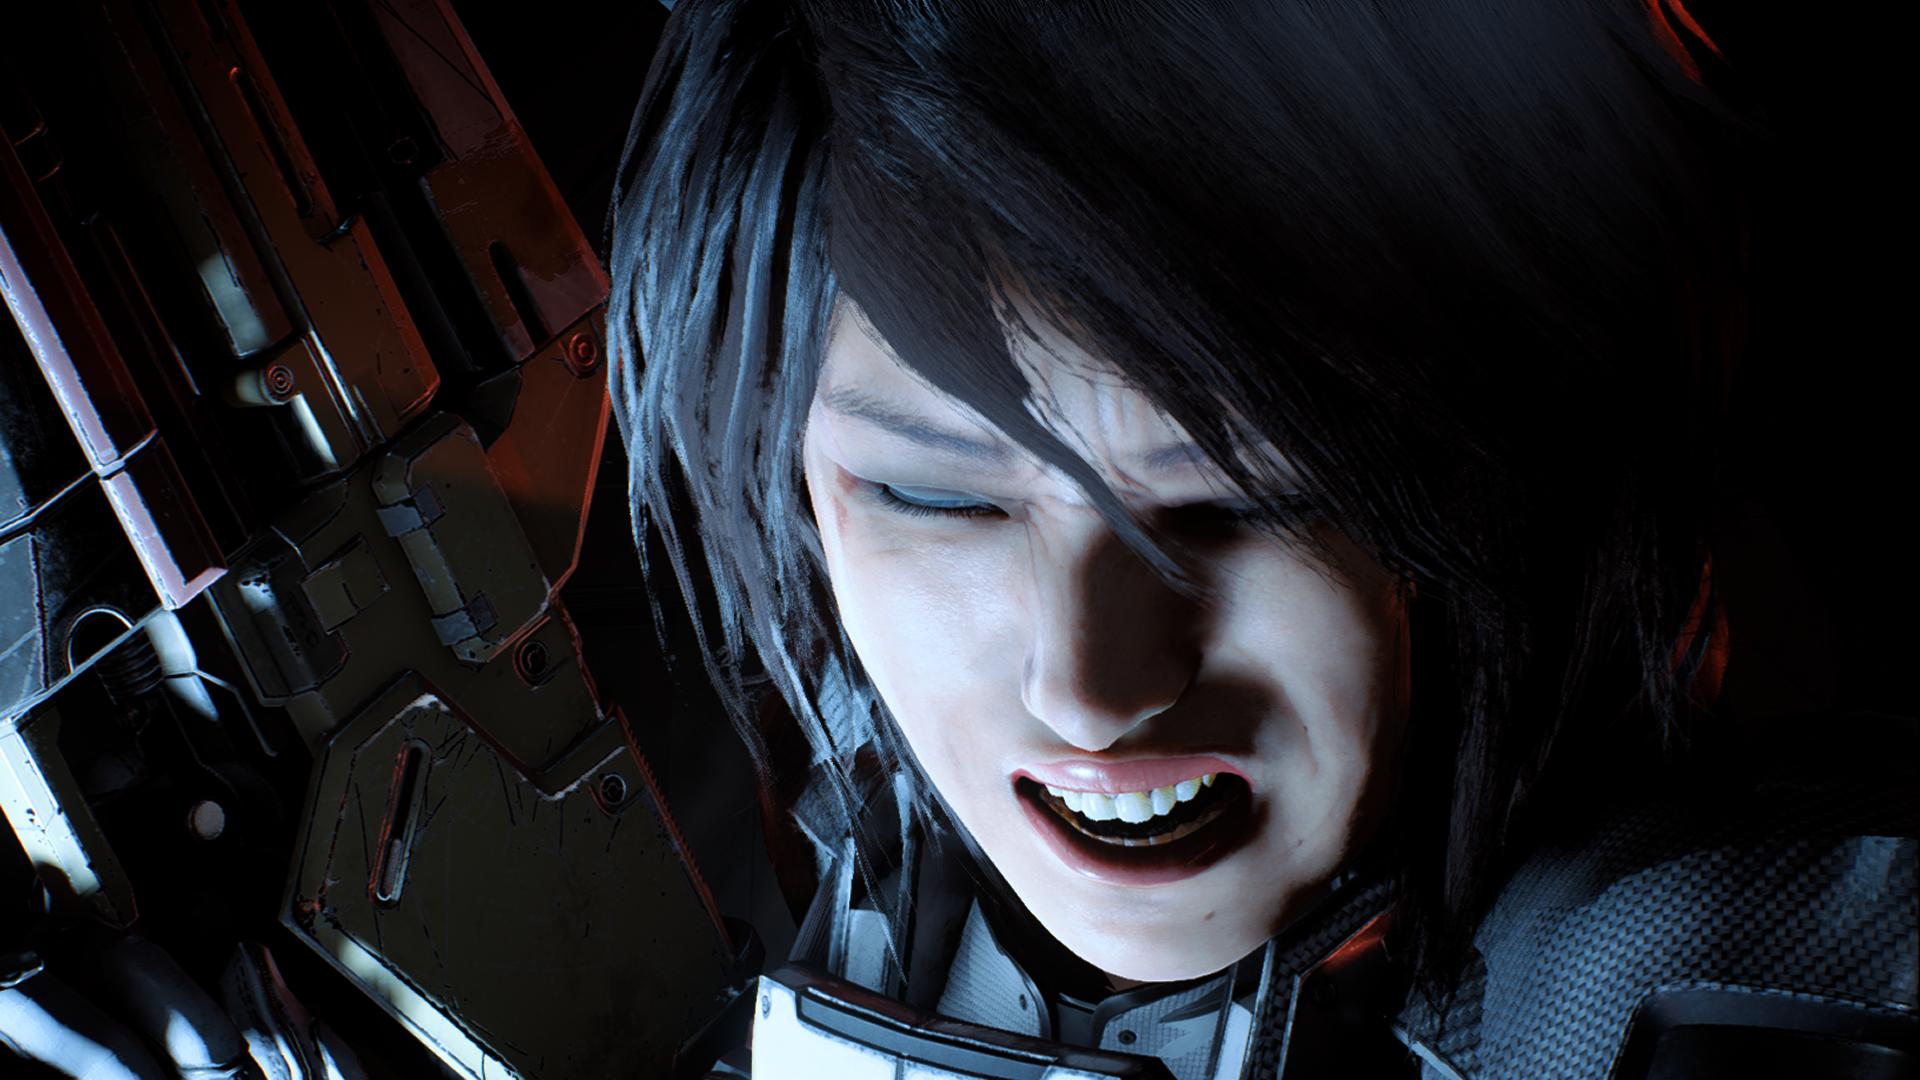 Сара Райдер - Mass Effect: Andromeda боль, крик, меридиан, Персонаж